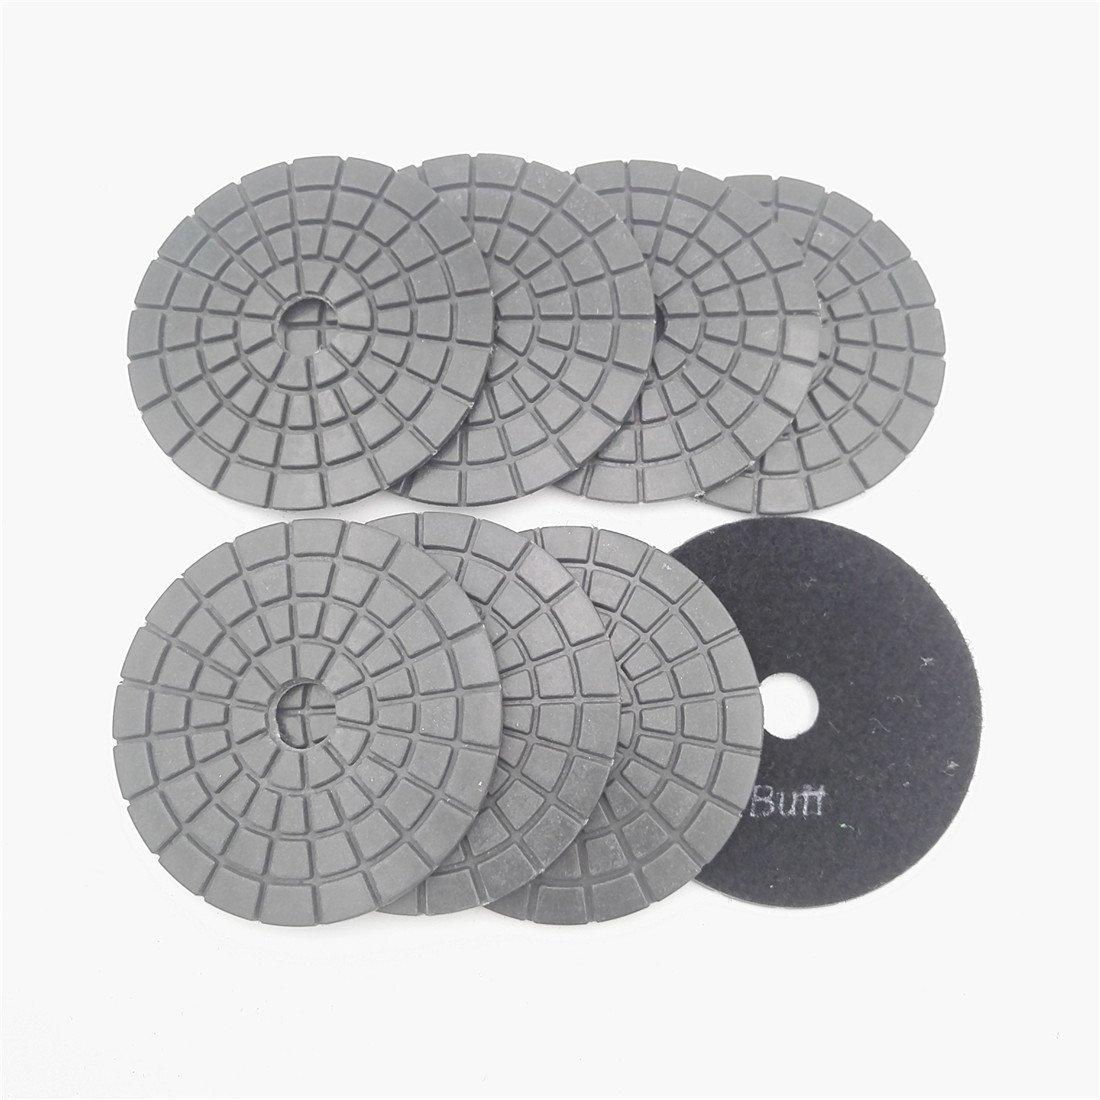 8pcs/set Professional polishing pads for marble & granite Diameter 4''/100mm wet sanding discs (8pcs Black Buff)